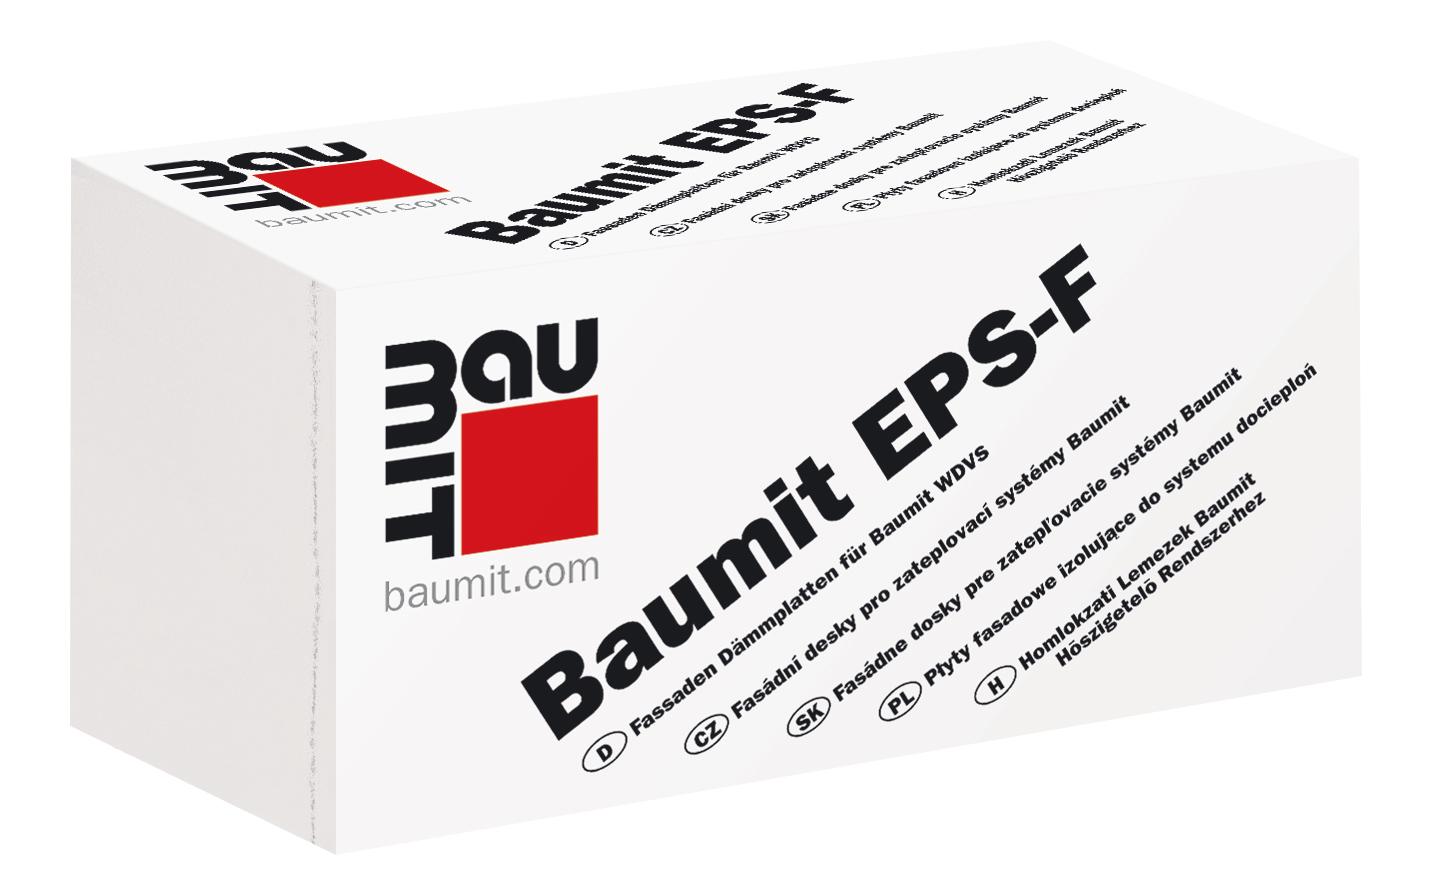 Fasádní polystyren EPS 70F BAUMIT 120 mm (1000x500 mm)